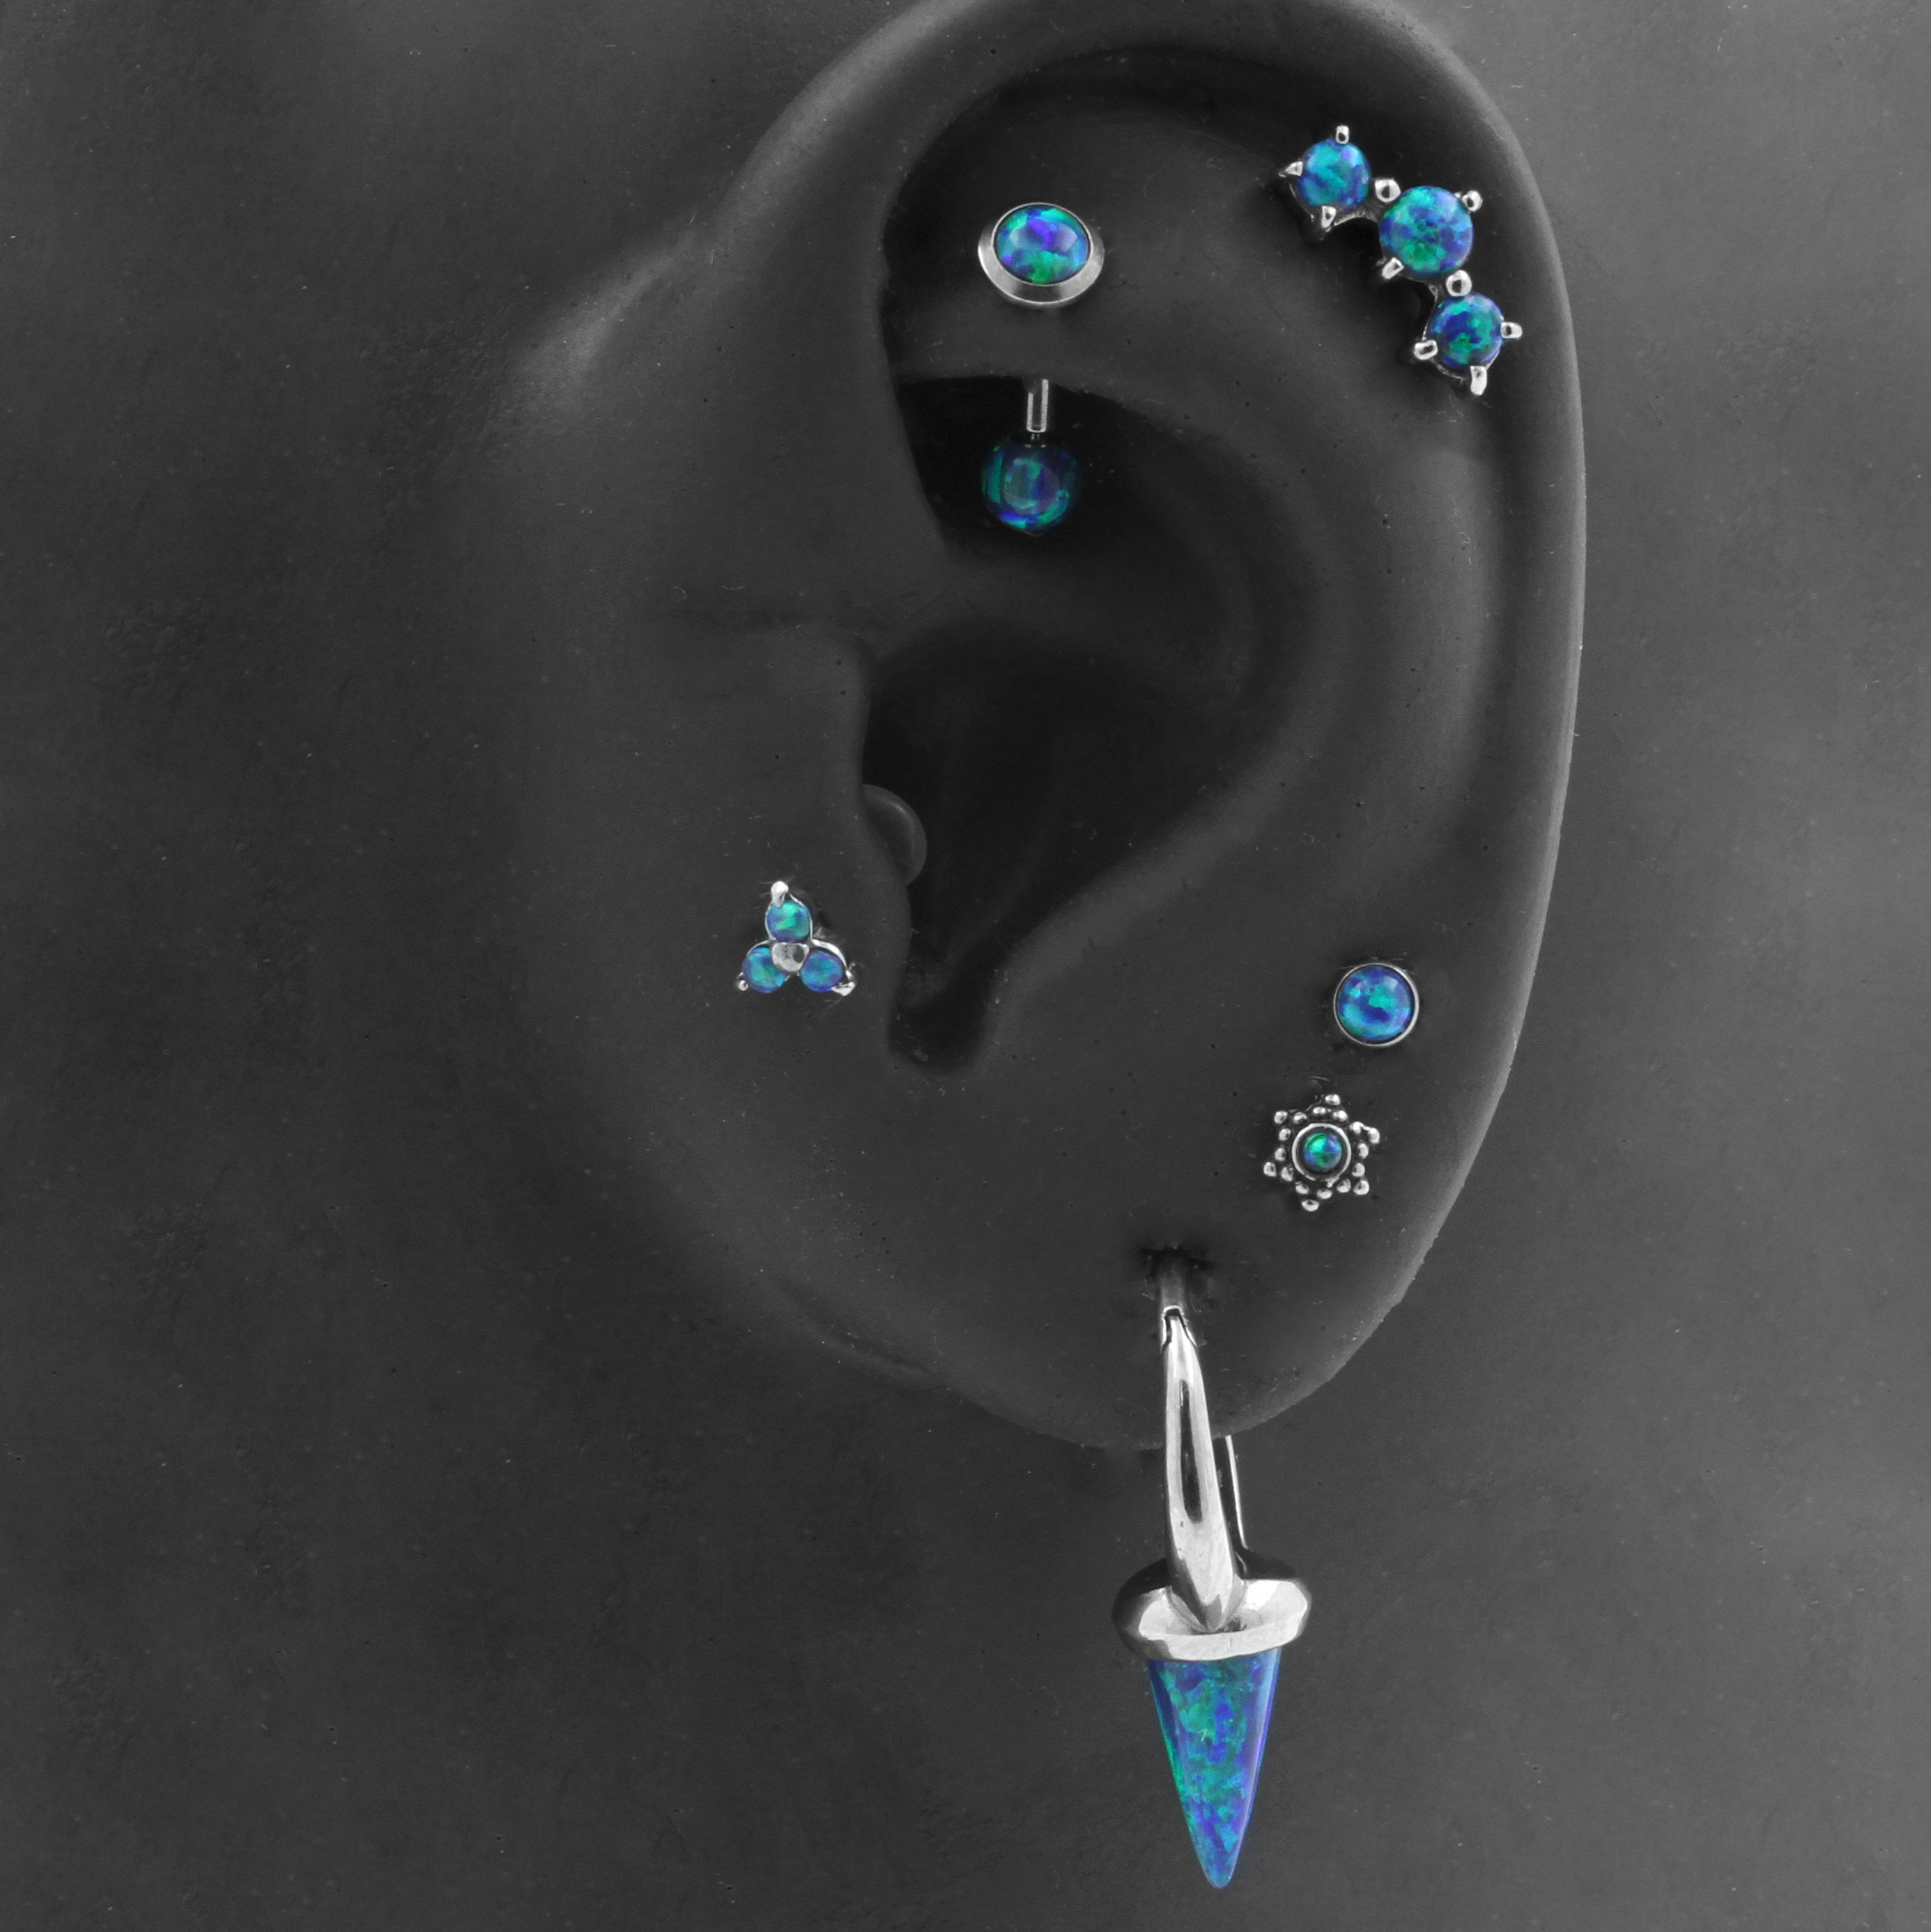 Oor 2 - Earparty Blauw Opaal